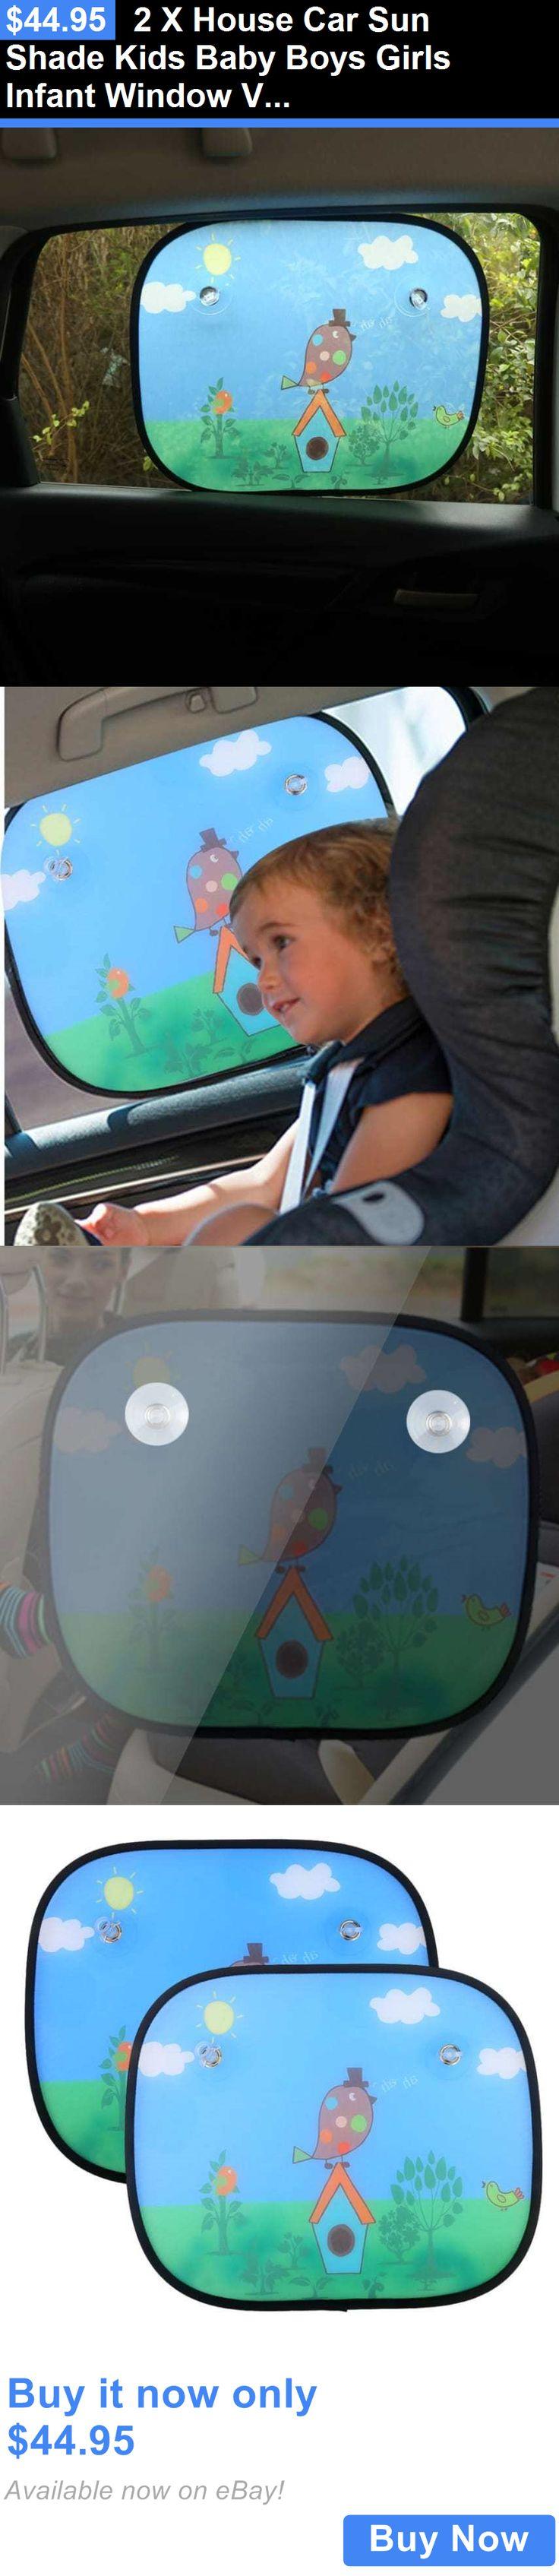 baby kid stuff: 2 X House Car Sun Shade Kids Baby Boys Girls Infant Window Visor Sunshade BUY IT NOW ONLY: $44.95